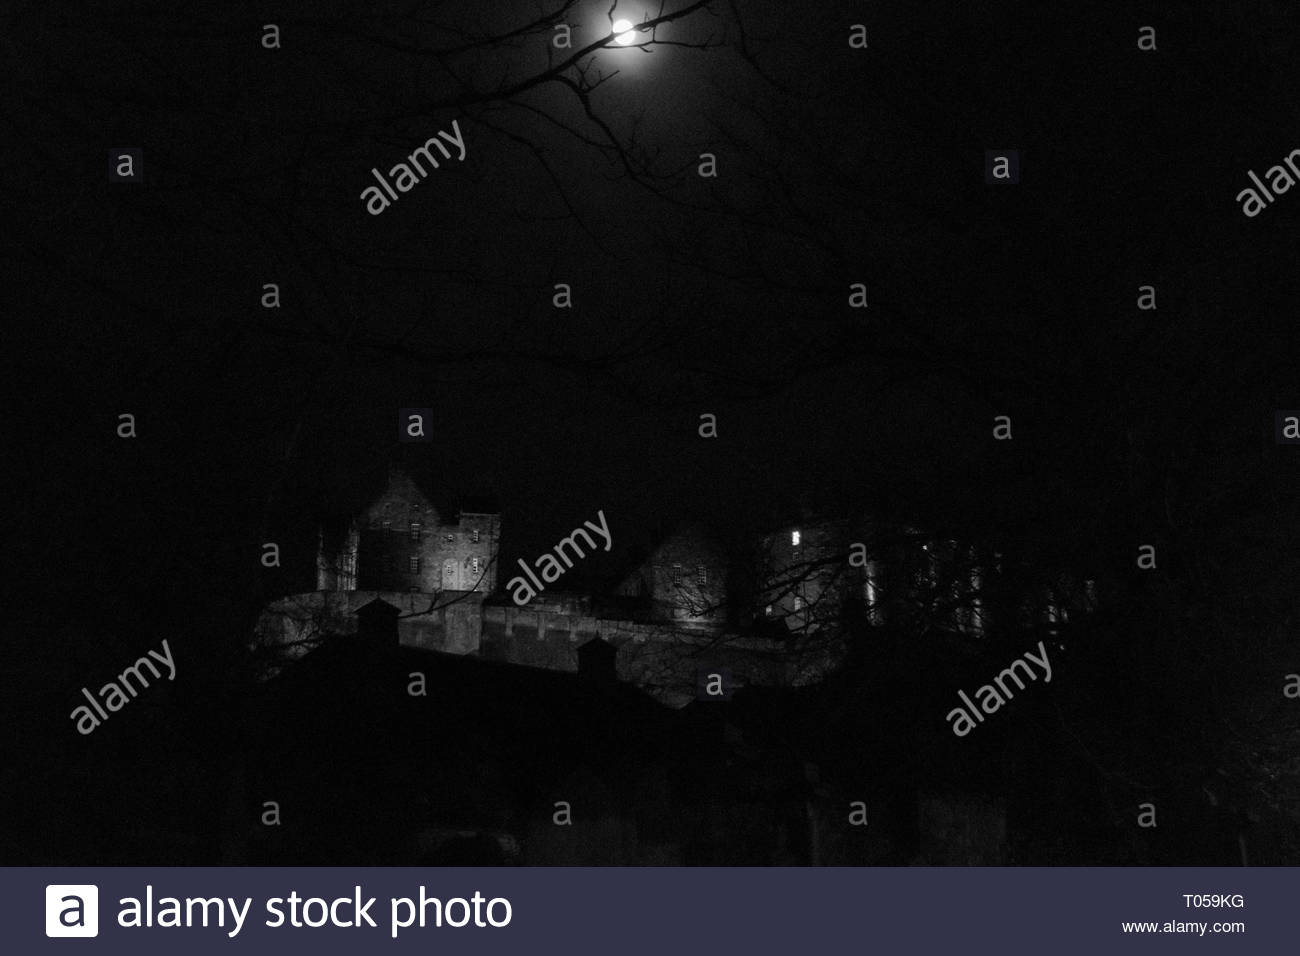 Monocrome picture of Edinburg castle at night - Stock Image